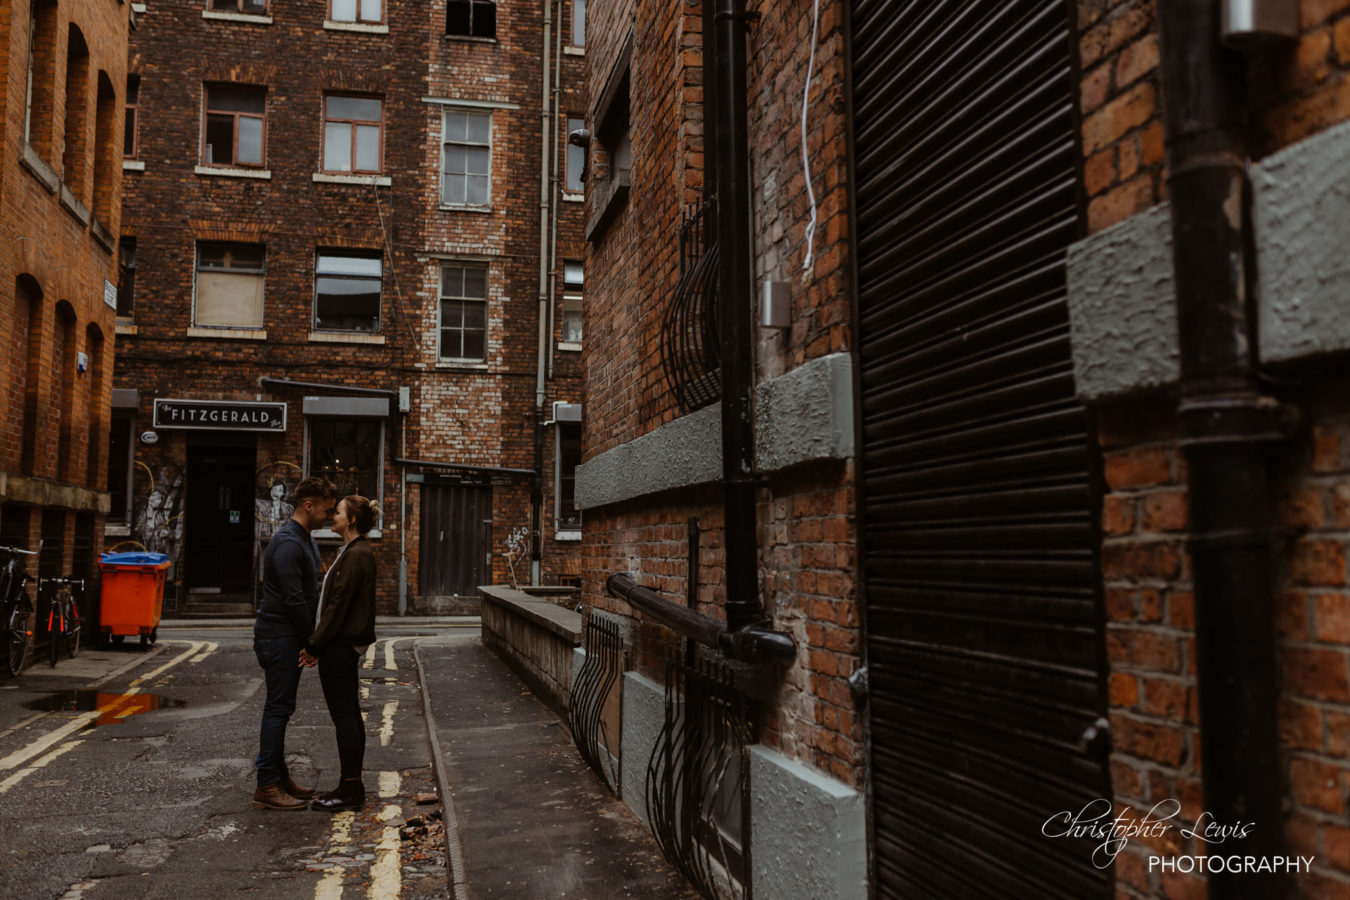 Northern-Quarter-Manchester-Pre-Wedding-Photoshoot-19